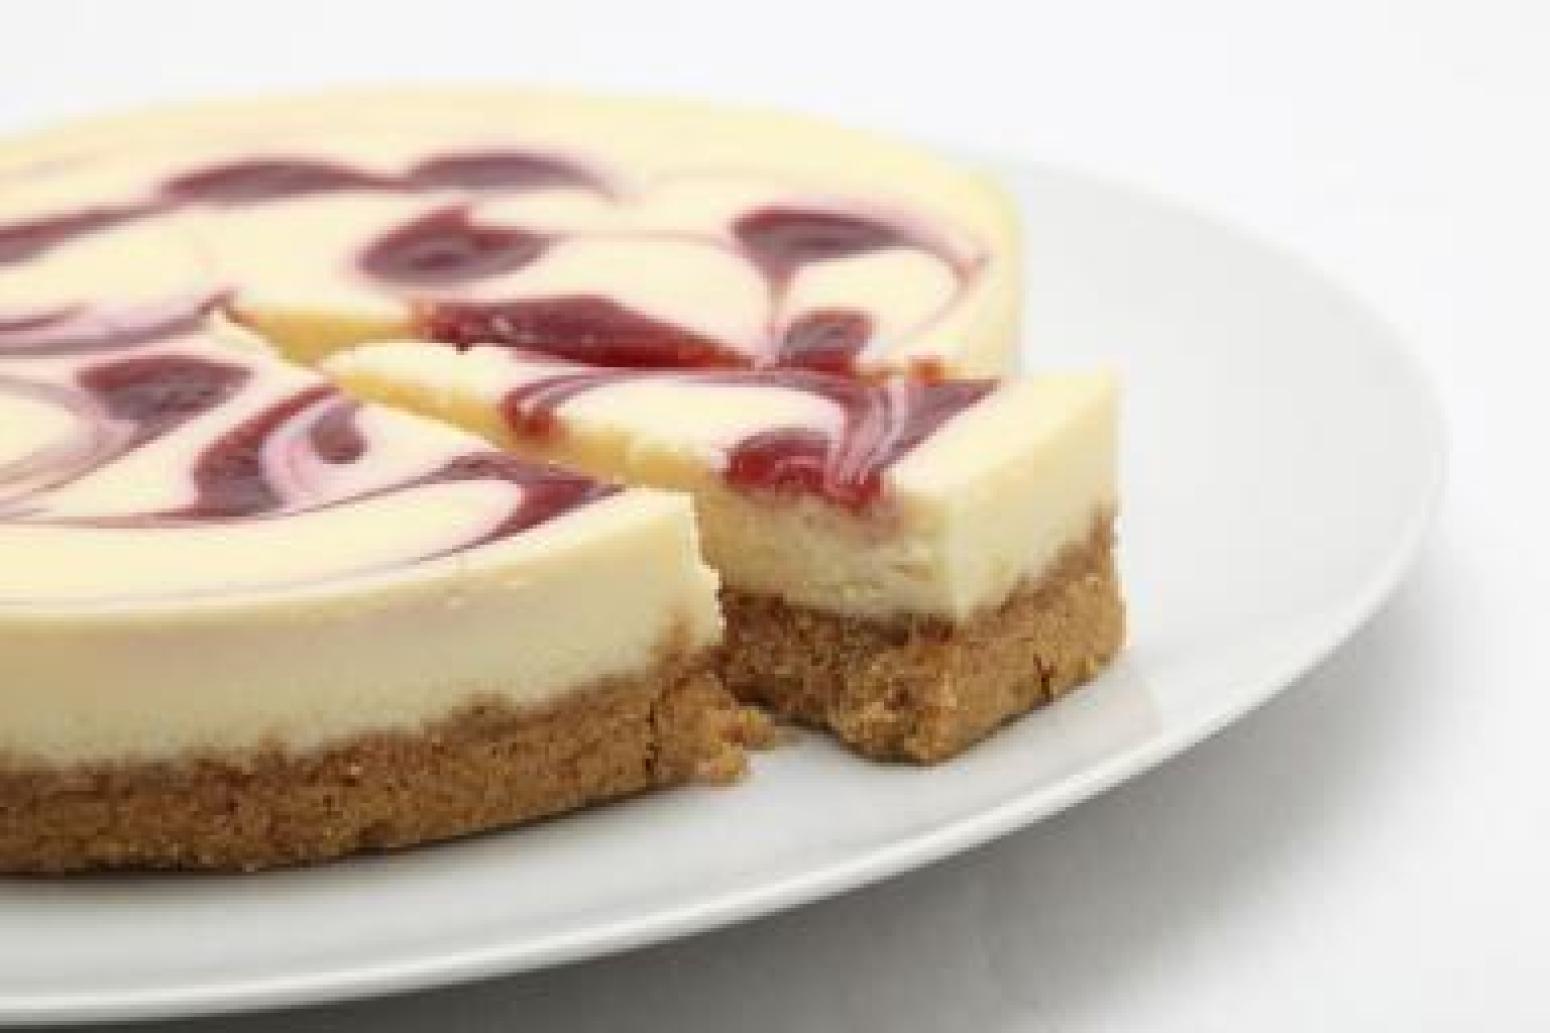 Raspberry Swirl Cheesecake Recipe 4 | Just A Pinch Recipes